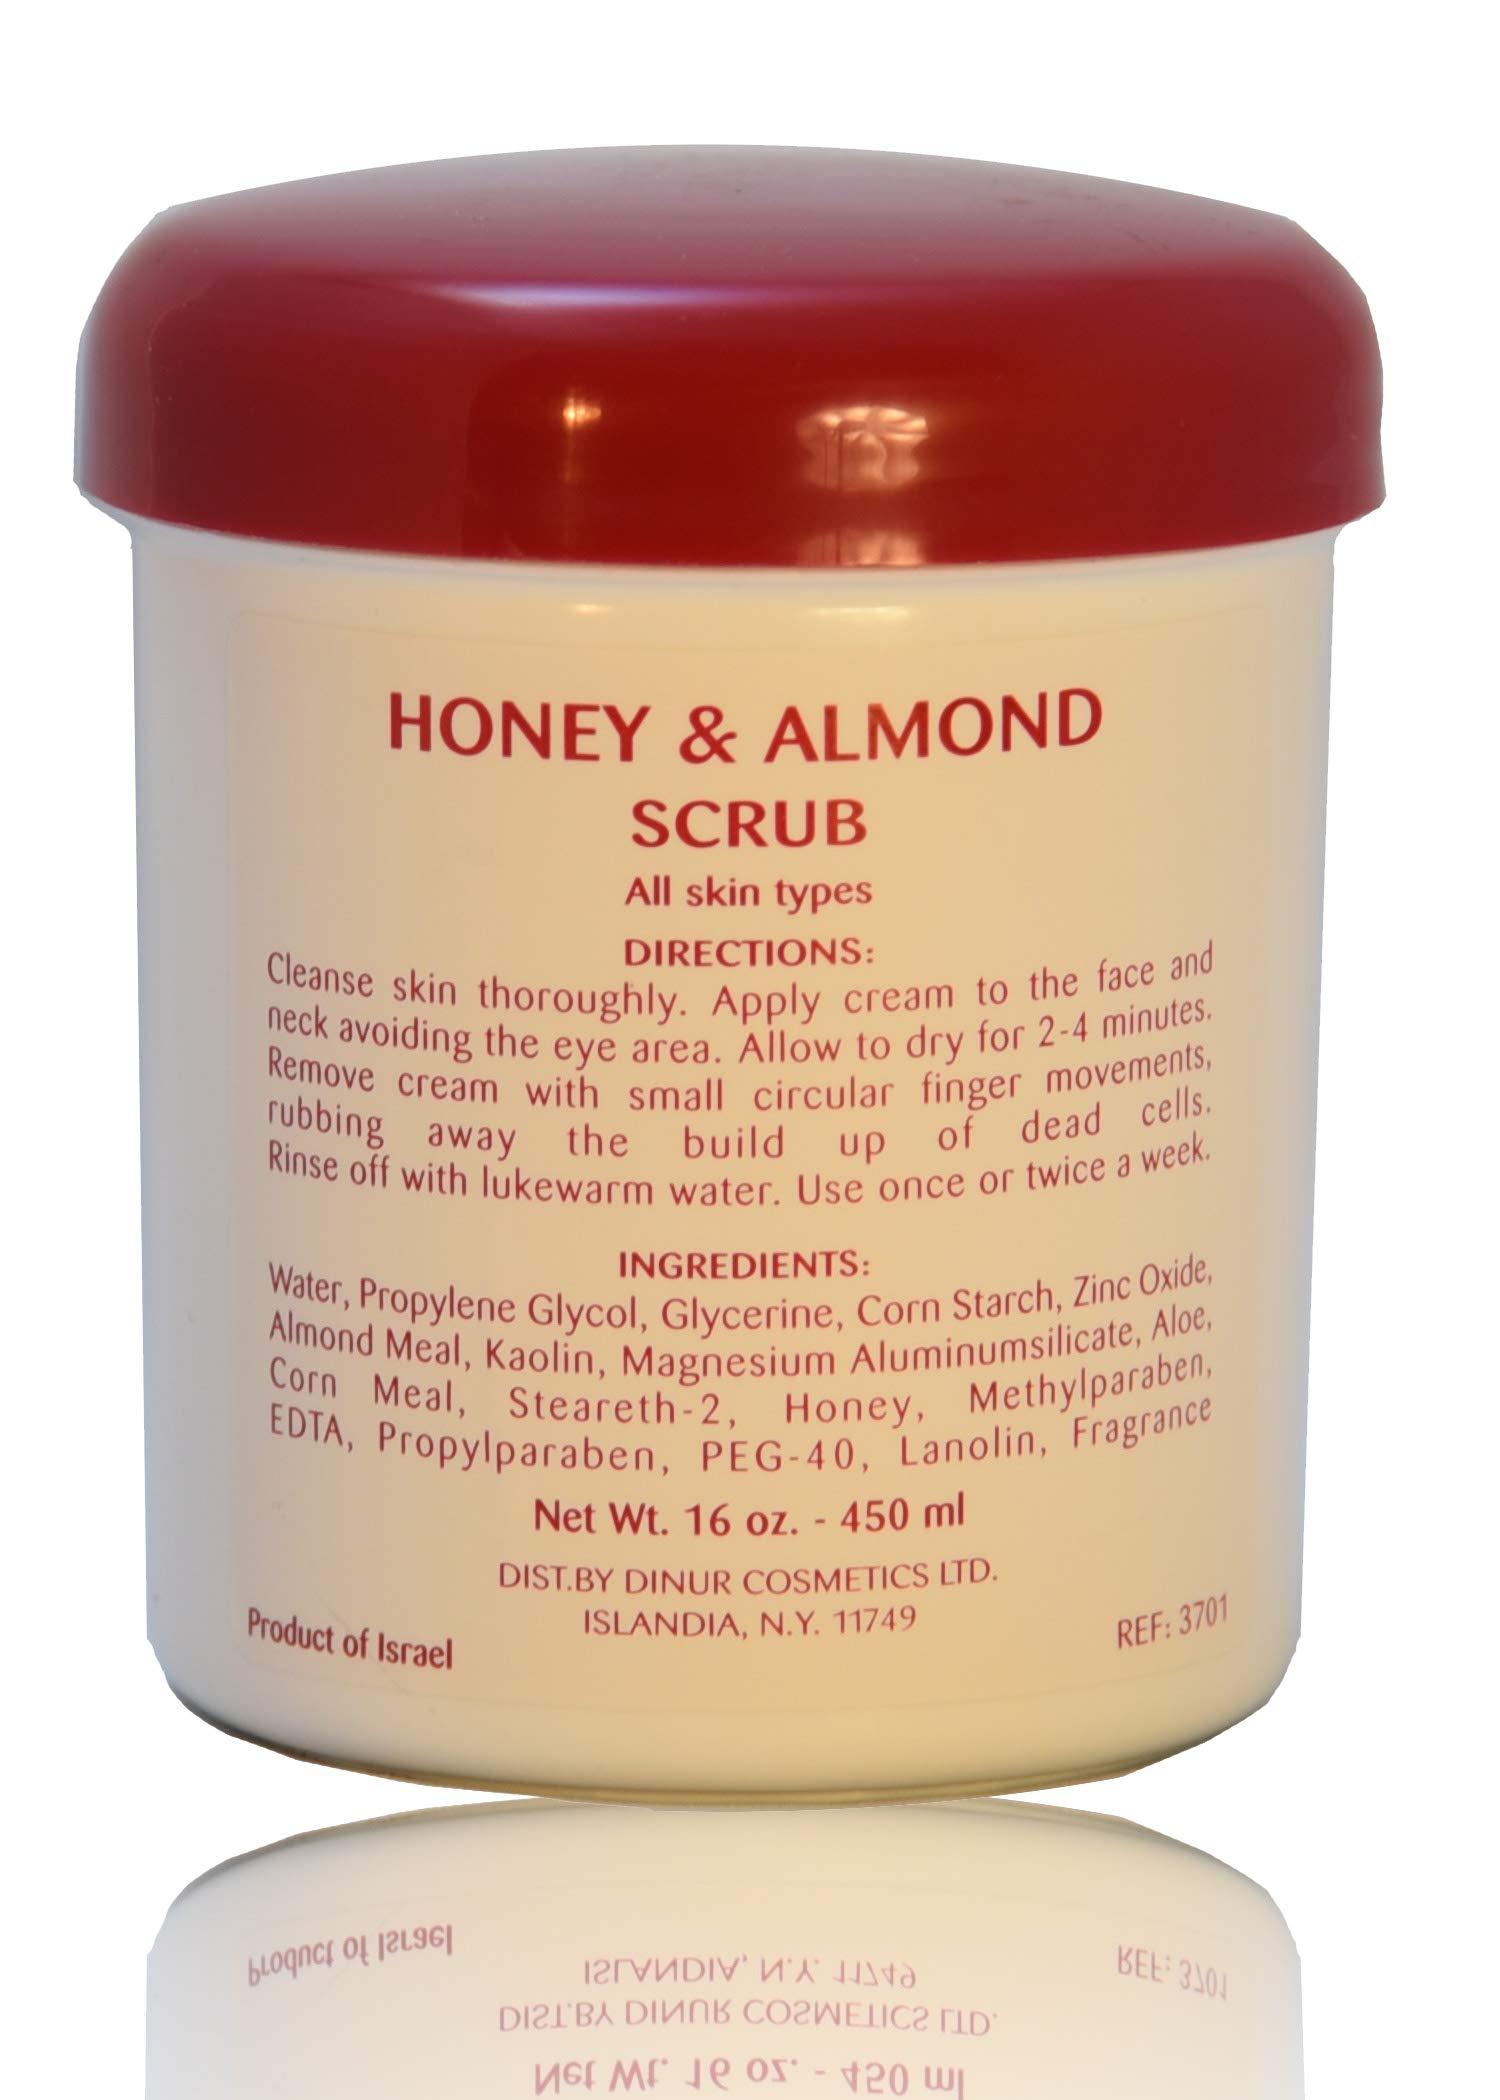 Dinur Cosmetics HONEY and ALMOND SCRUB 16 OZ. EXFOLIATOR FOR ALL SKIN TYPES